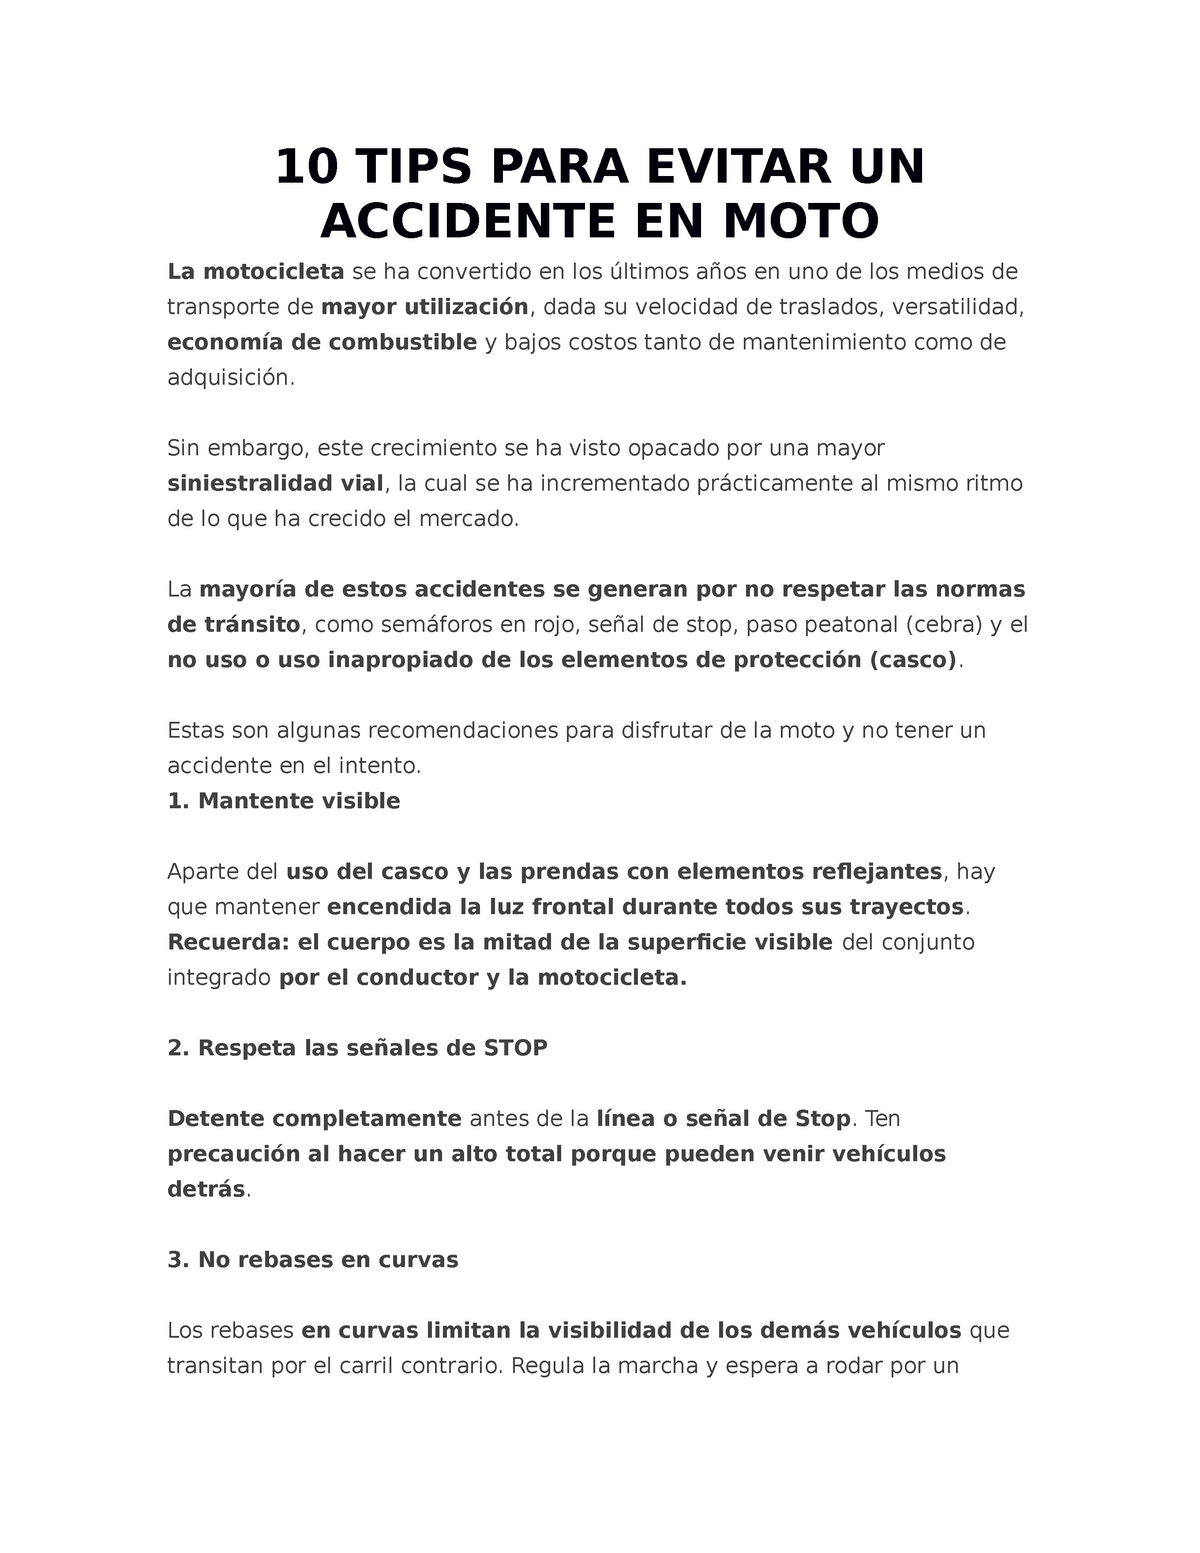 421a8695bf4 10 TIPS PARA Evitar UN Accidente EN MOTO - Derecho - StuDocu